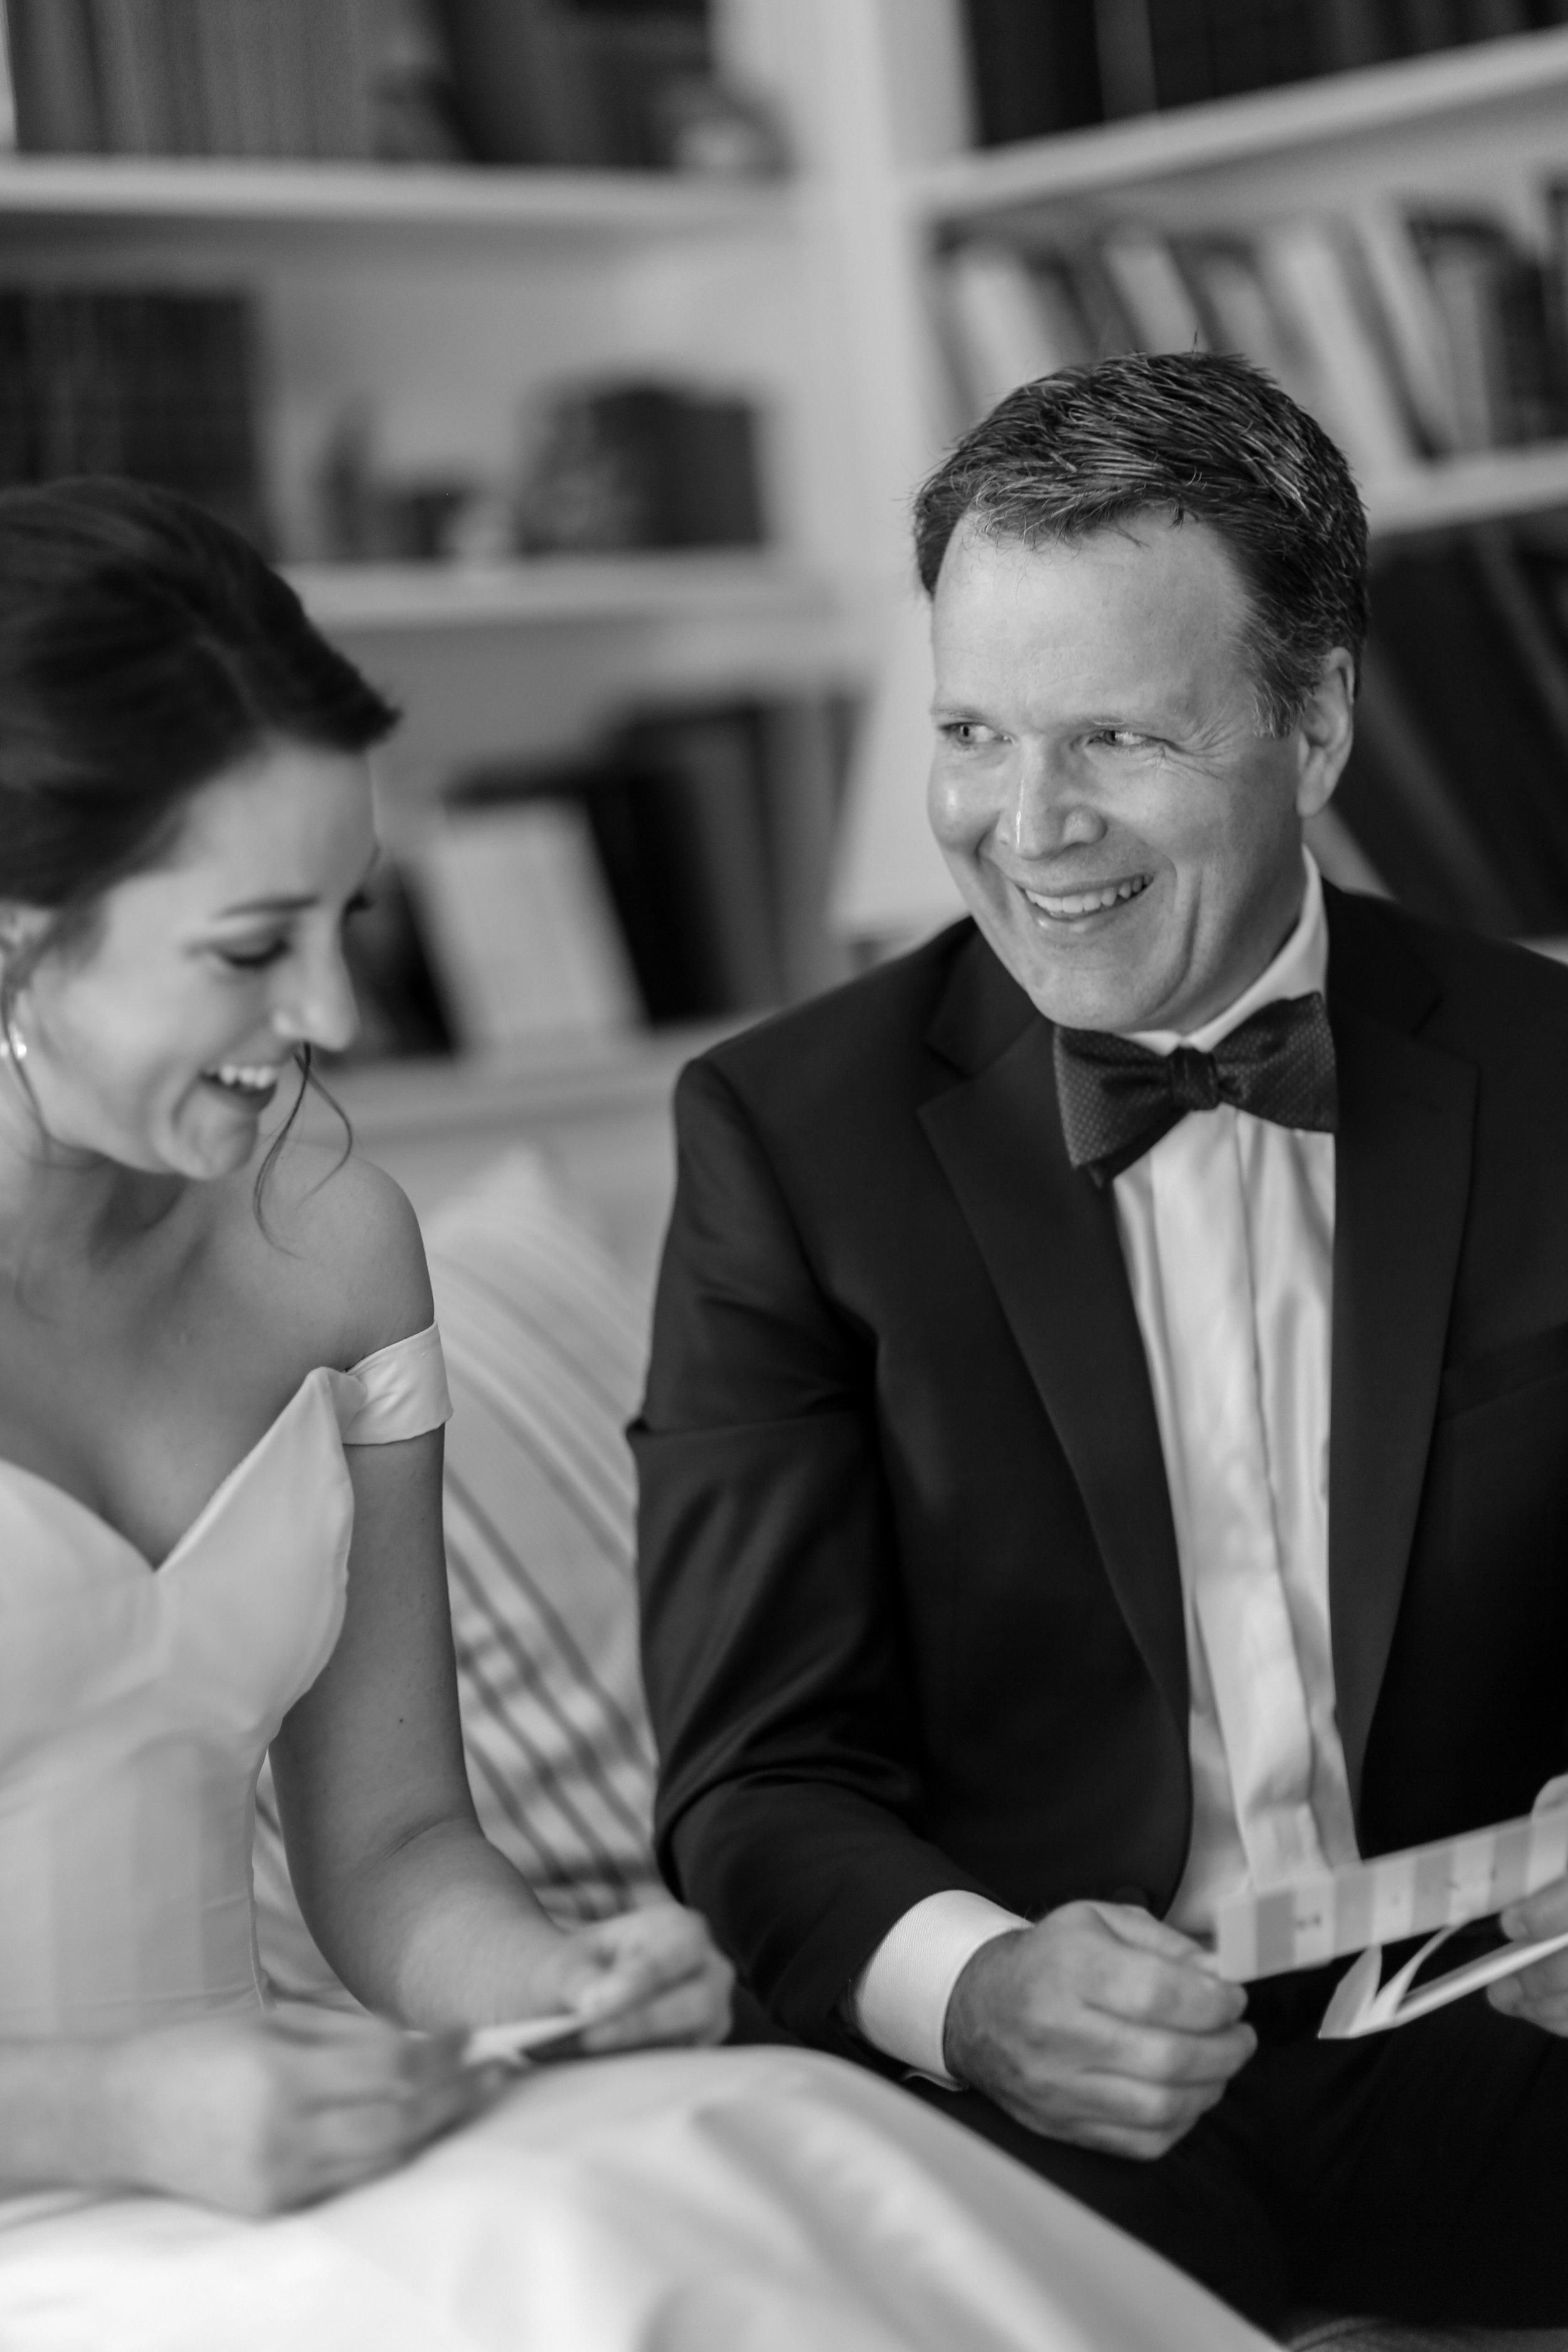 Jeremie_Barlow_Photography_Steffen_Sudyam_wedding_2018-300.jpg